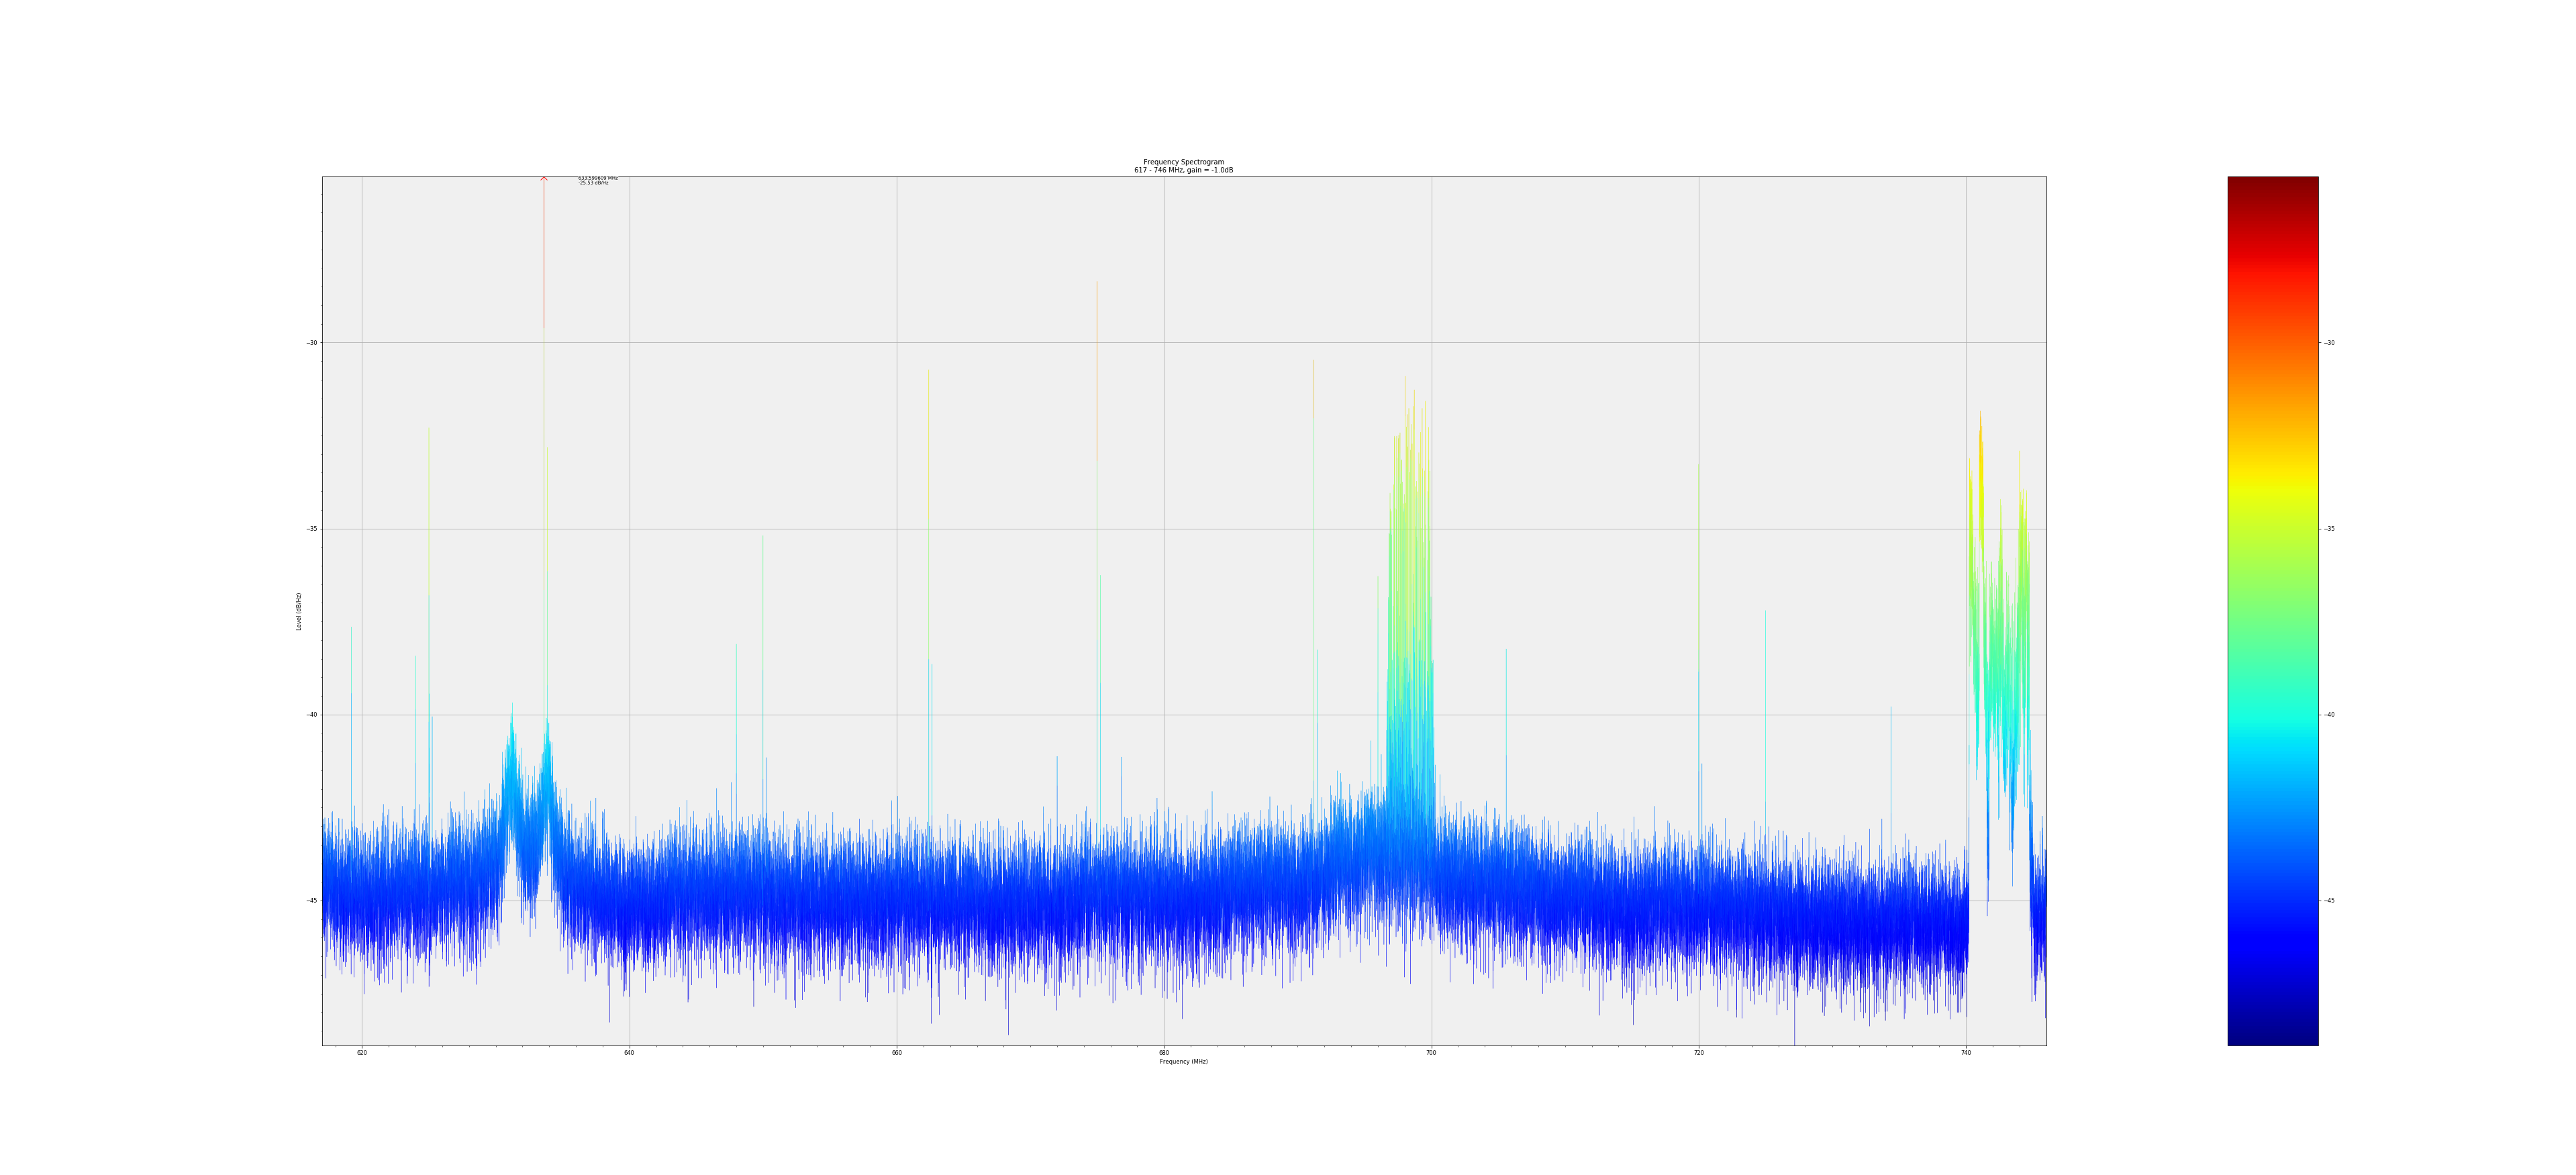 LTE range 1 - 2ft from GPUs